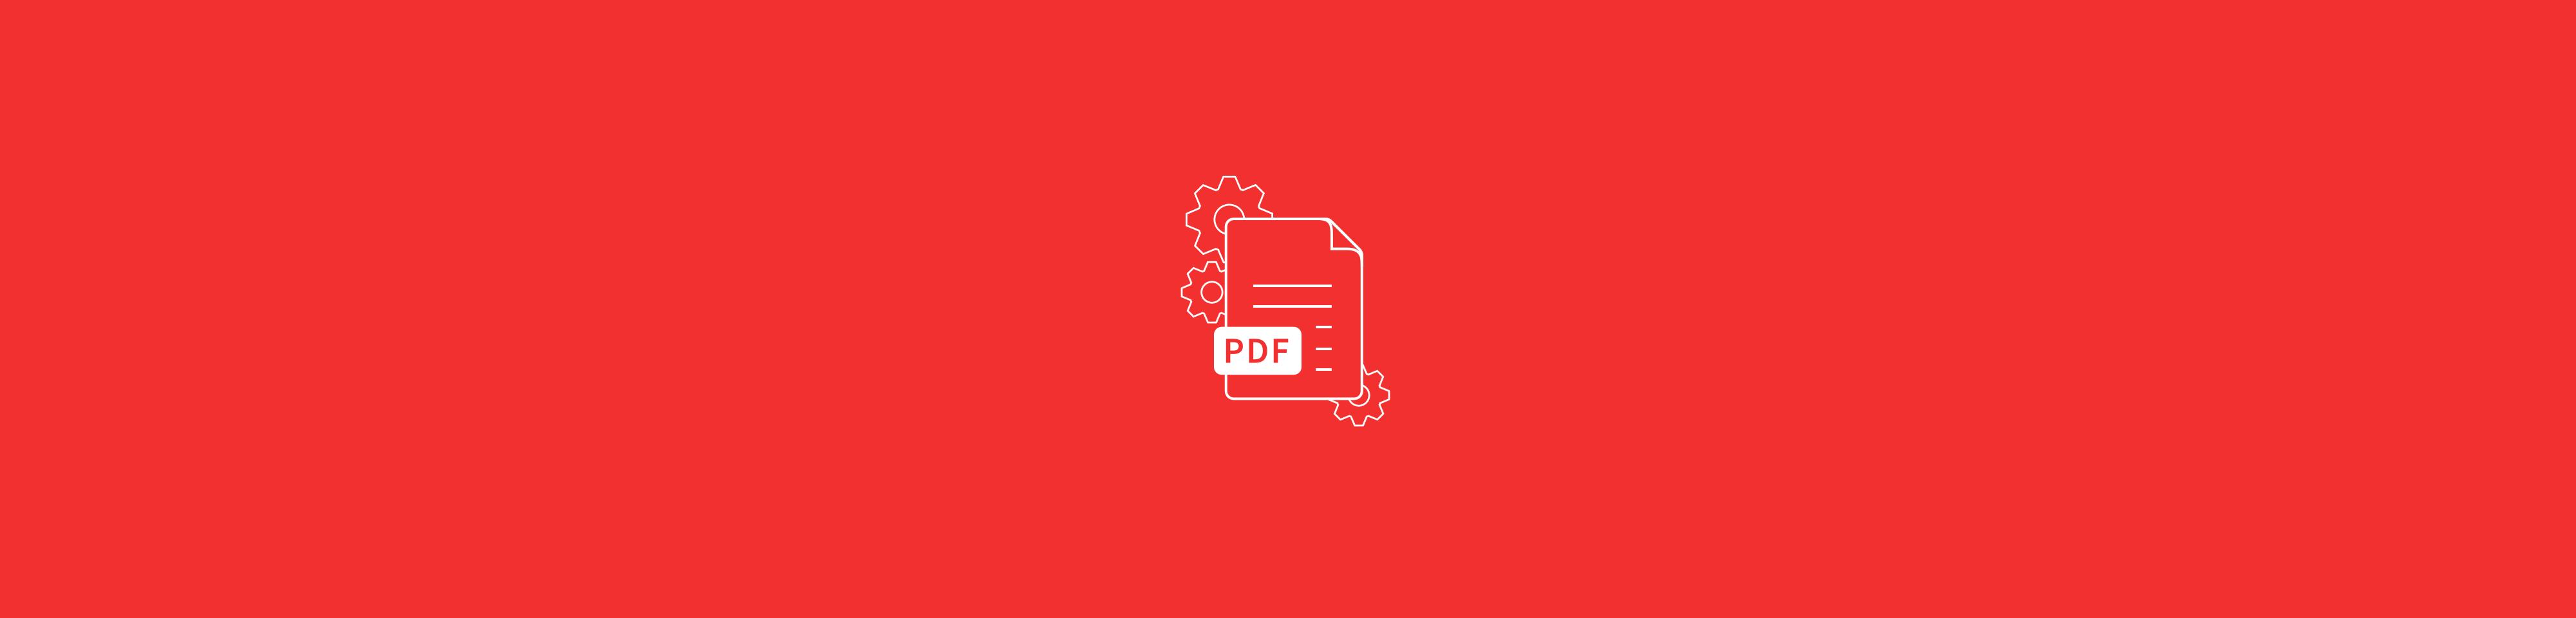 Reduce PDF File Size Below 100 KB Online